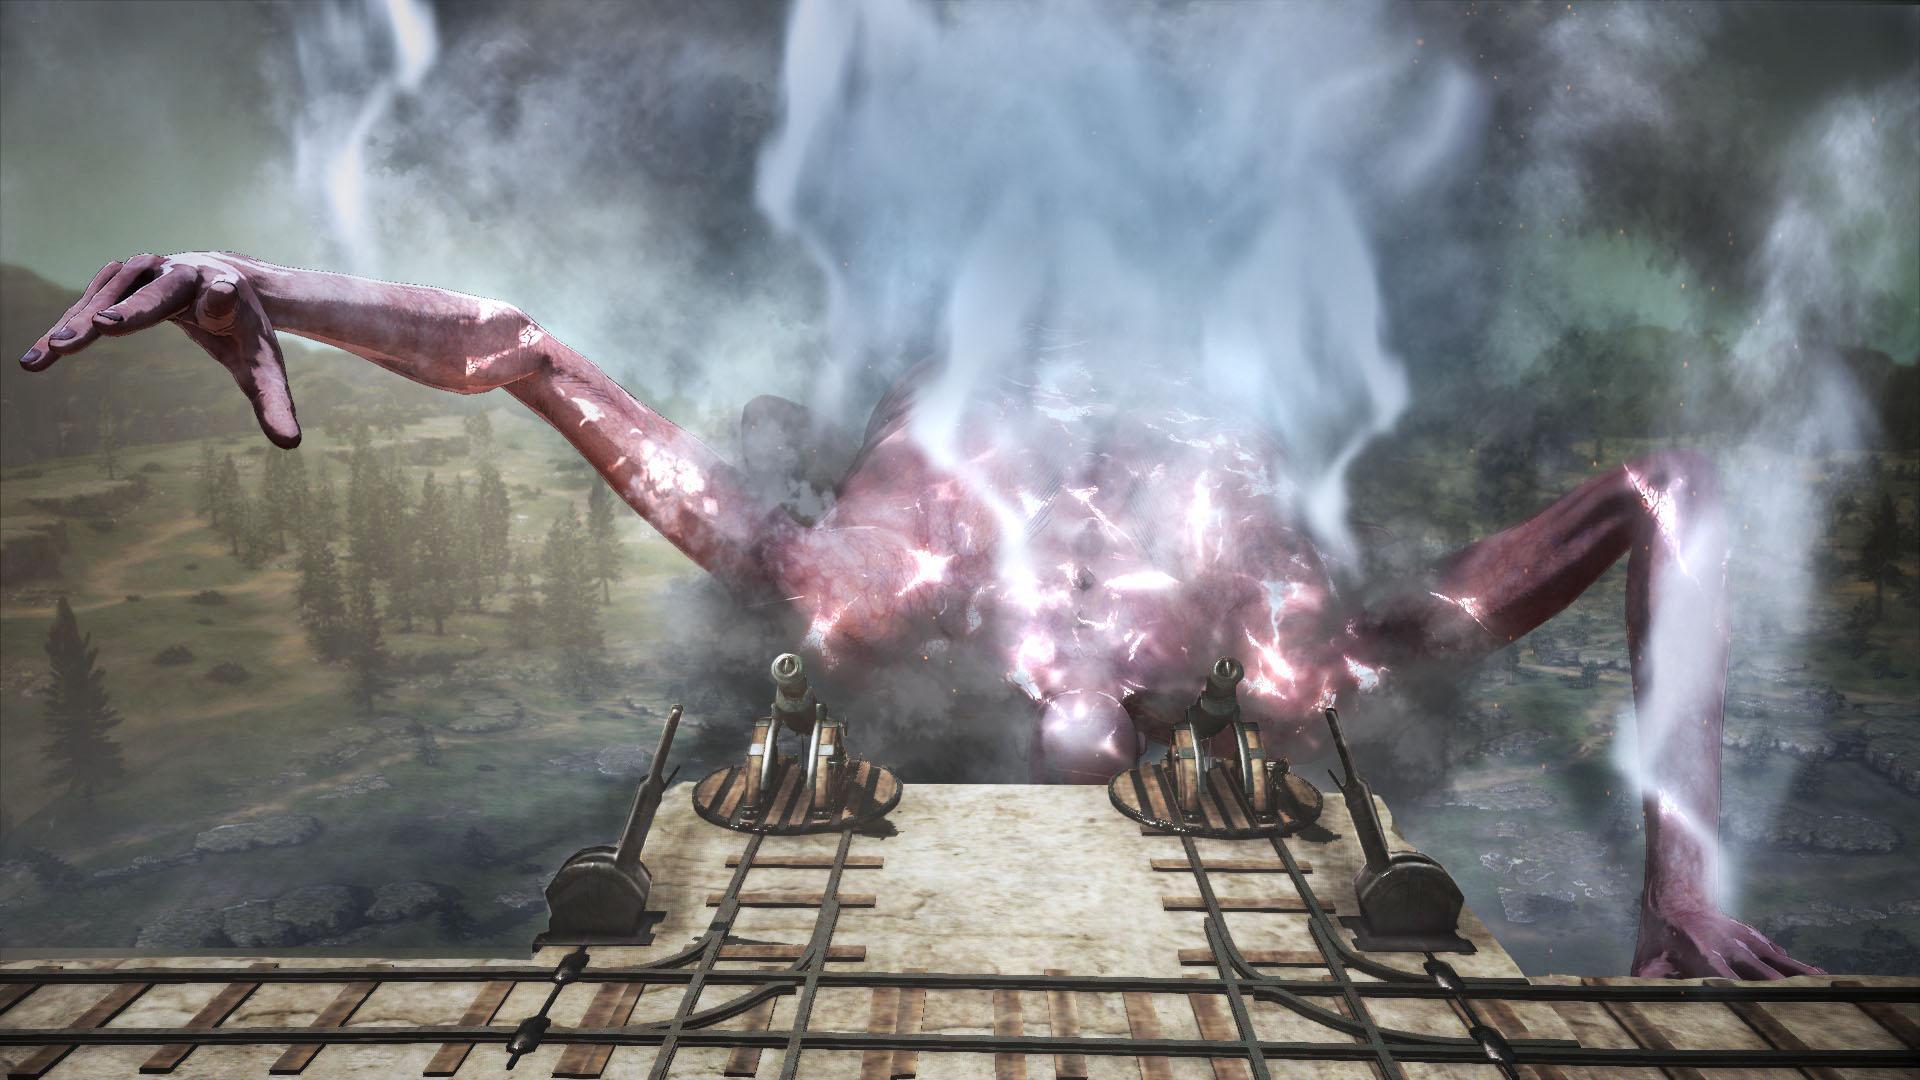 Attack on Titan 2: Final Battle Upgrade Pack / A O T  2: Final Battle  Upgrade Pack / 進撃の巨人2 -Final Battle- アップグレードパック